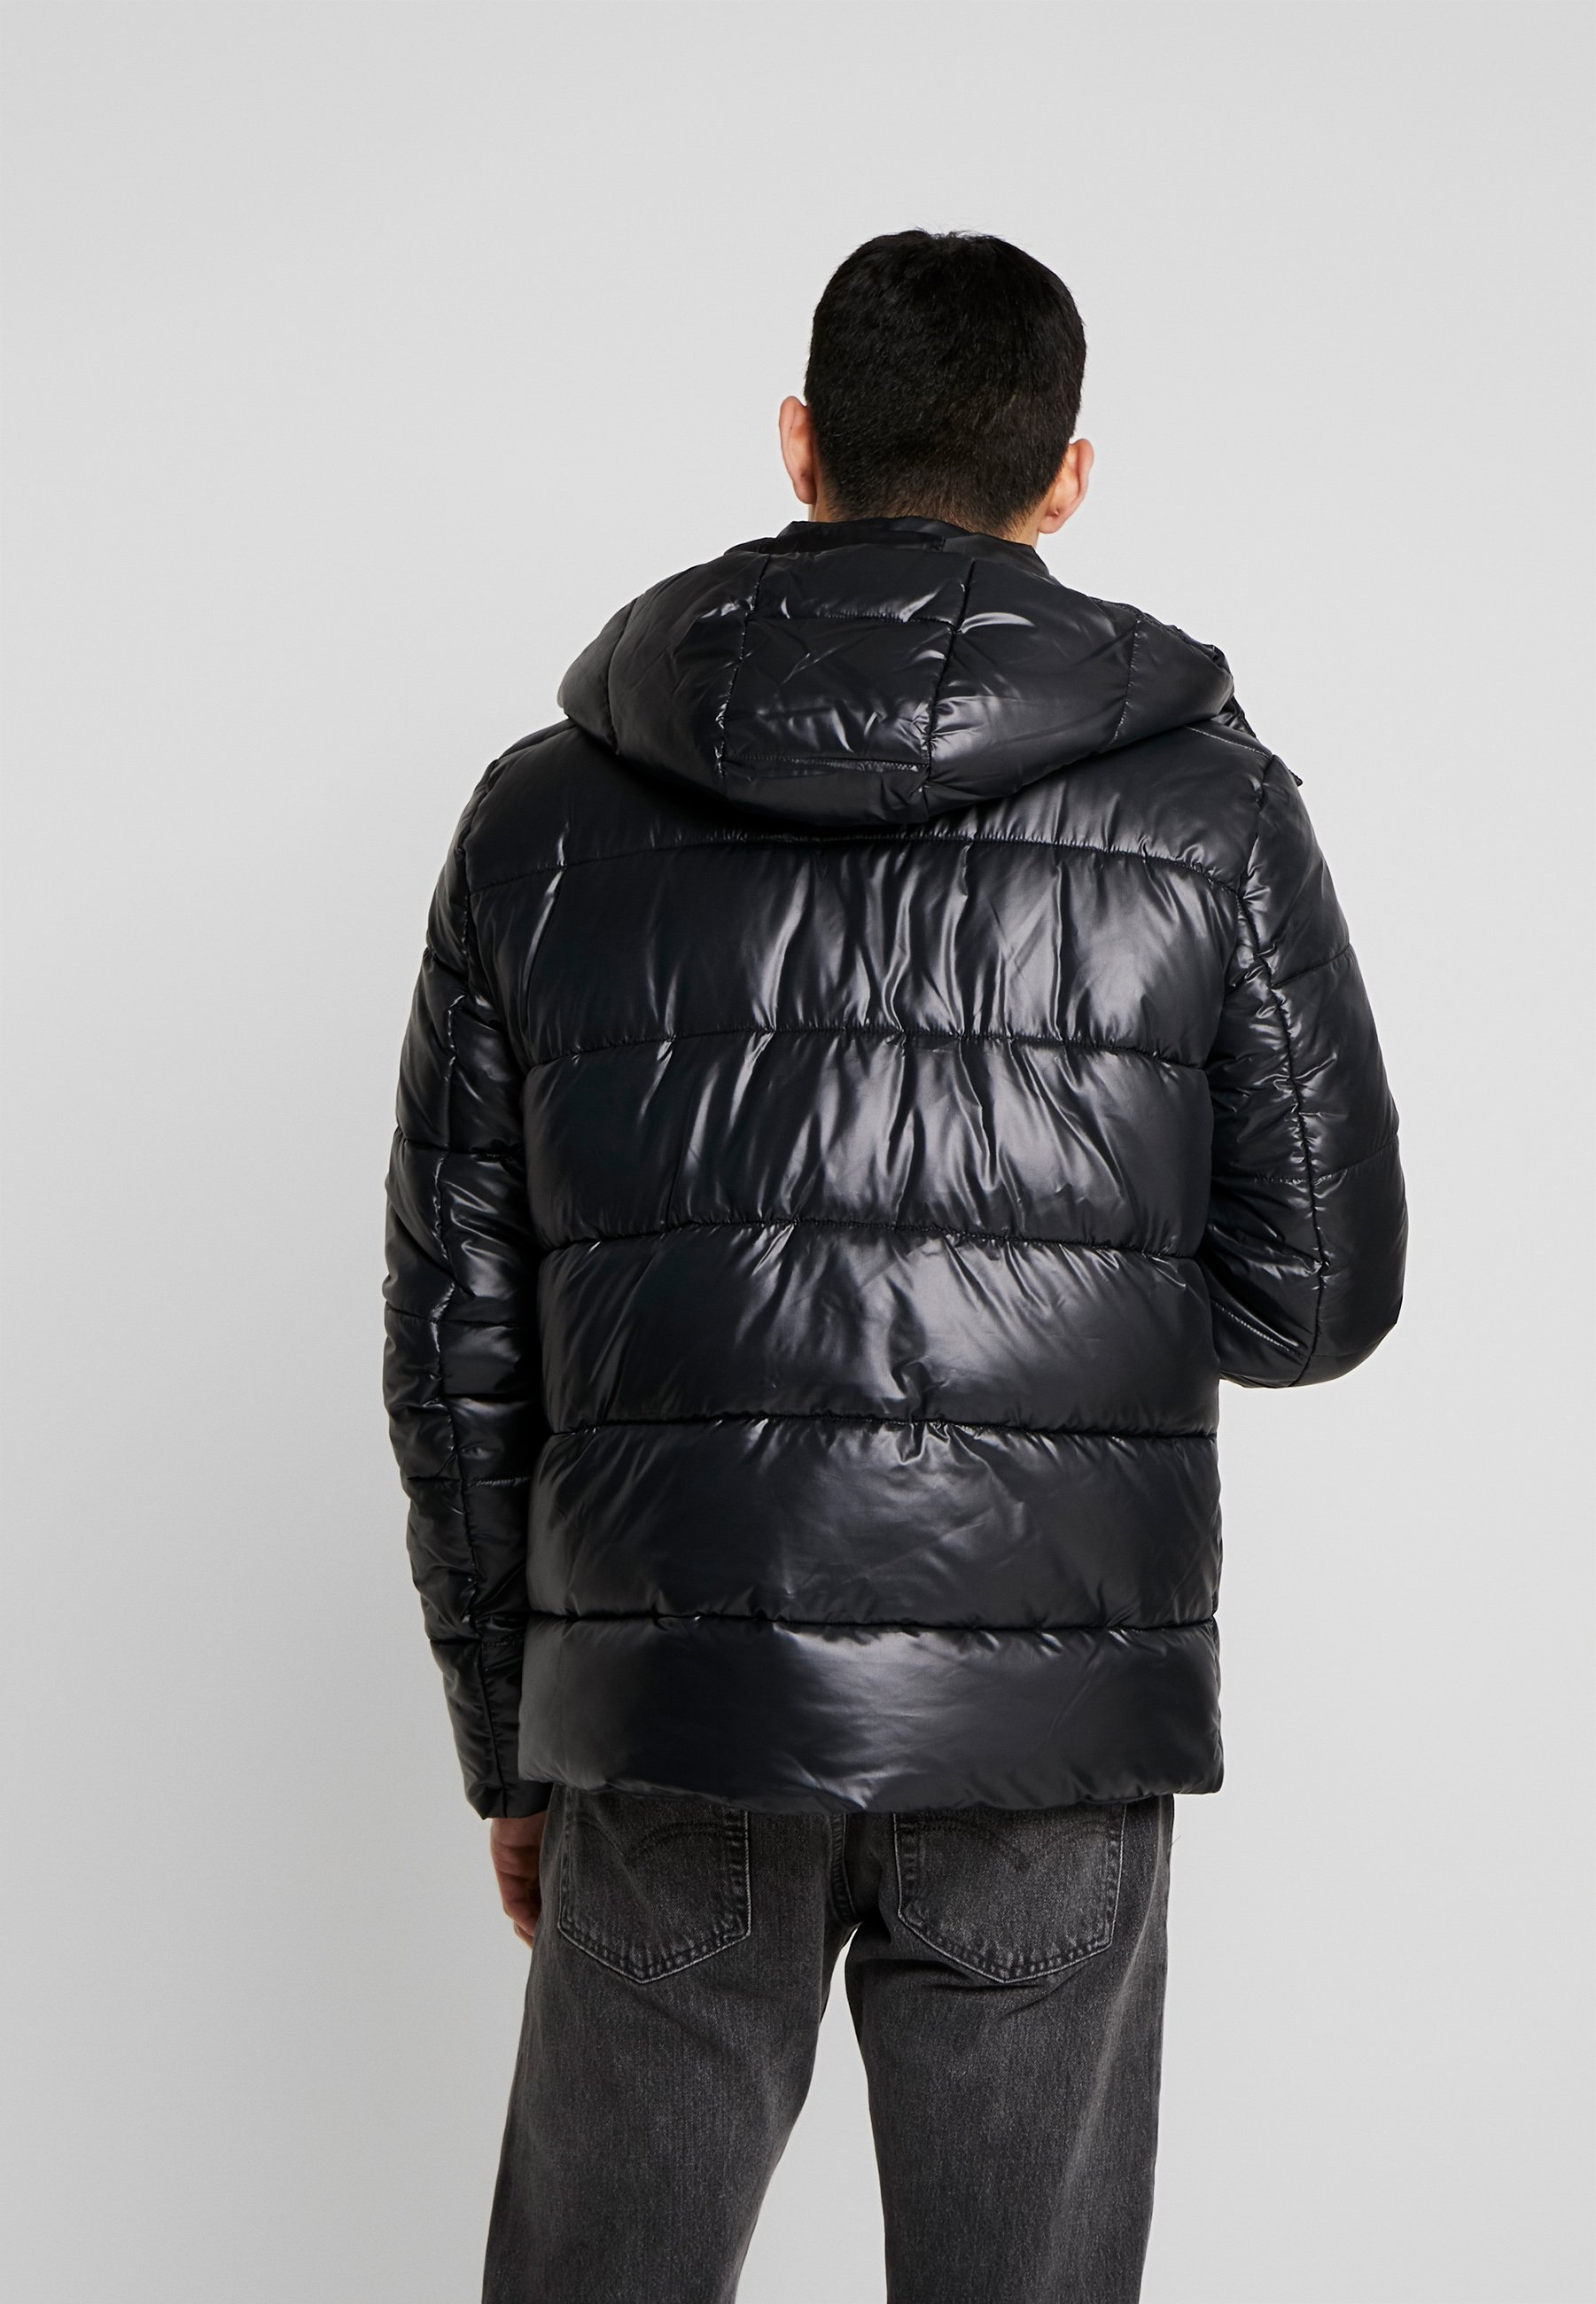 2020 Discount New Arrival Men's Clothing Urban Classics HOODED VANISH PUFFER JACKET Winter jacket black VjaHsqPAC 2ShoCi7za